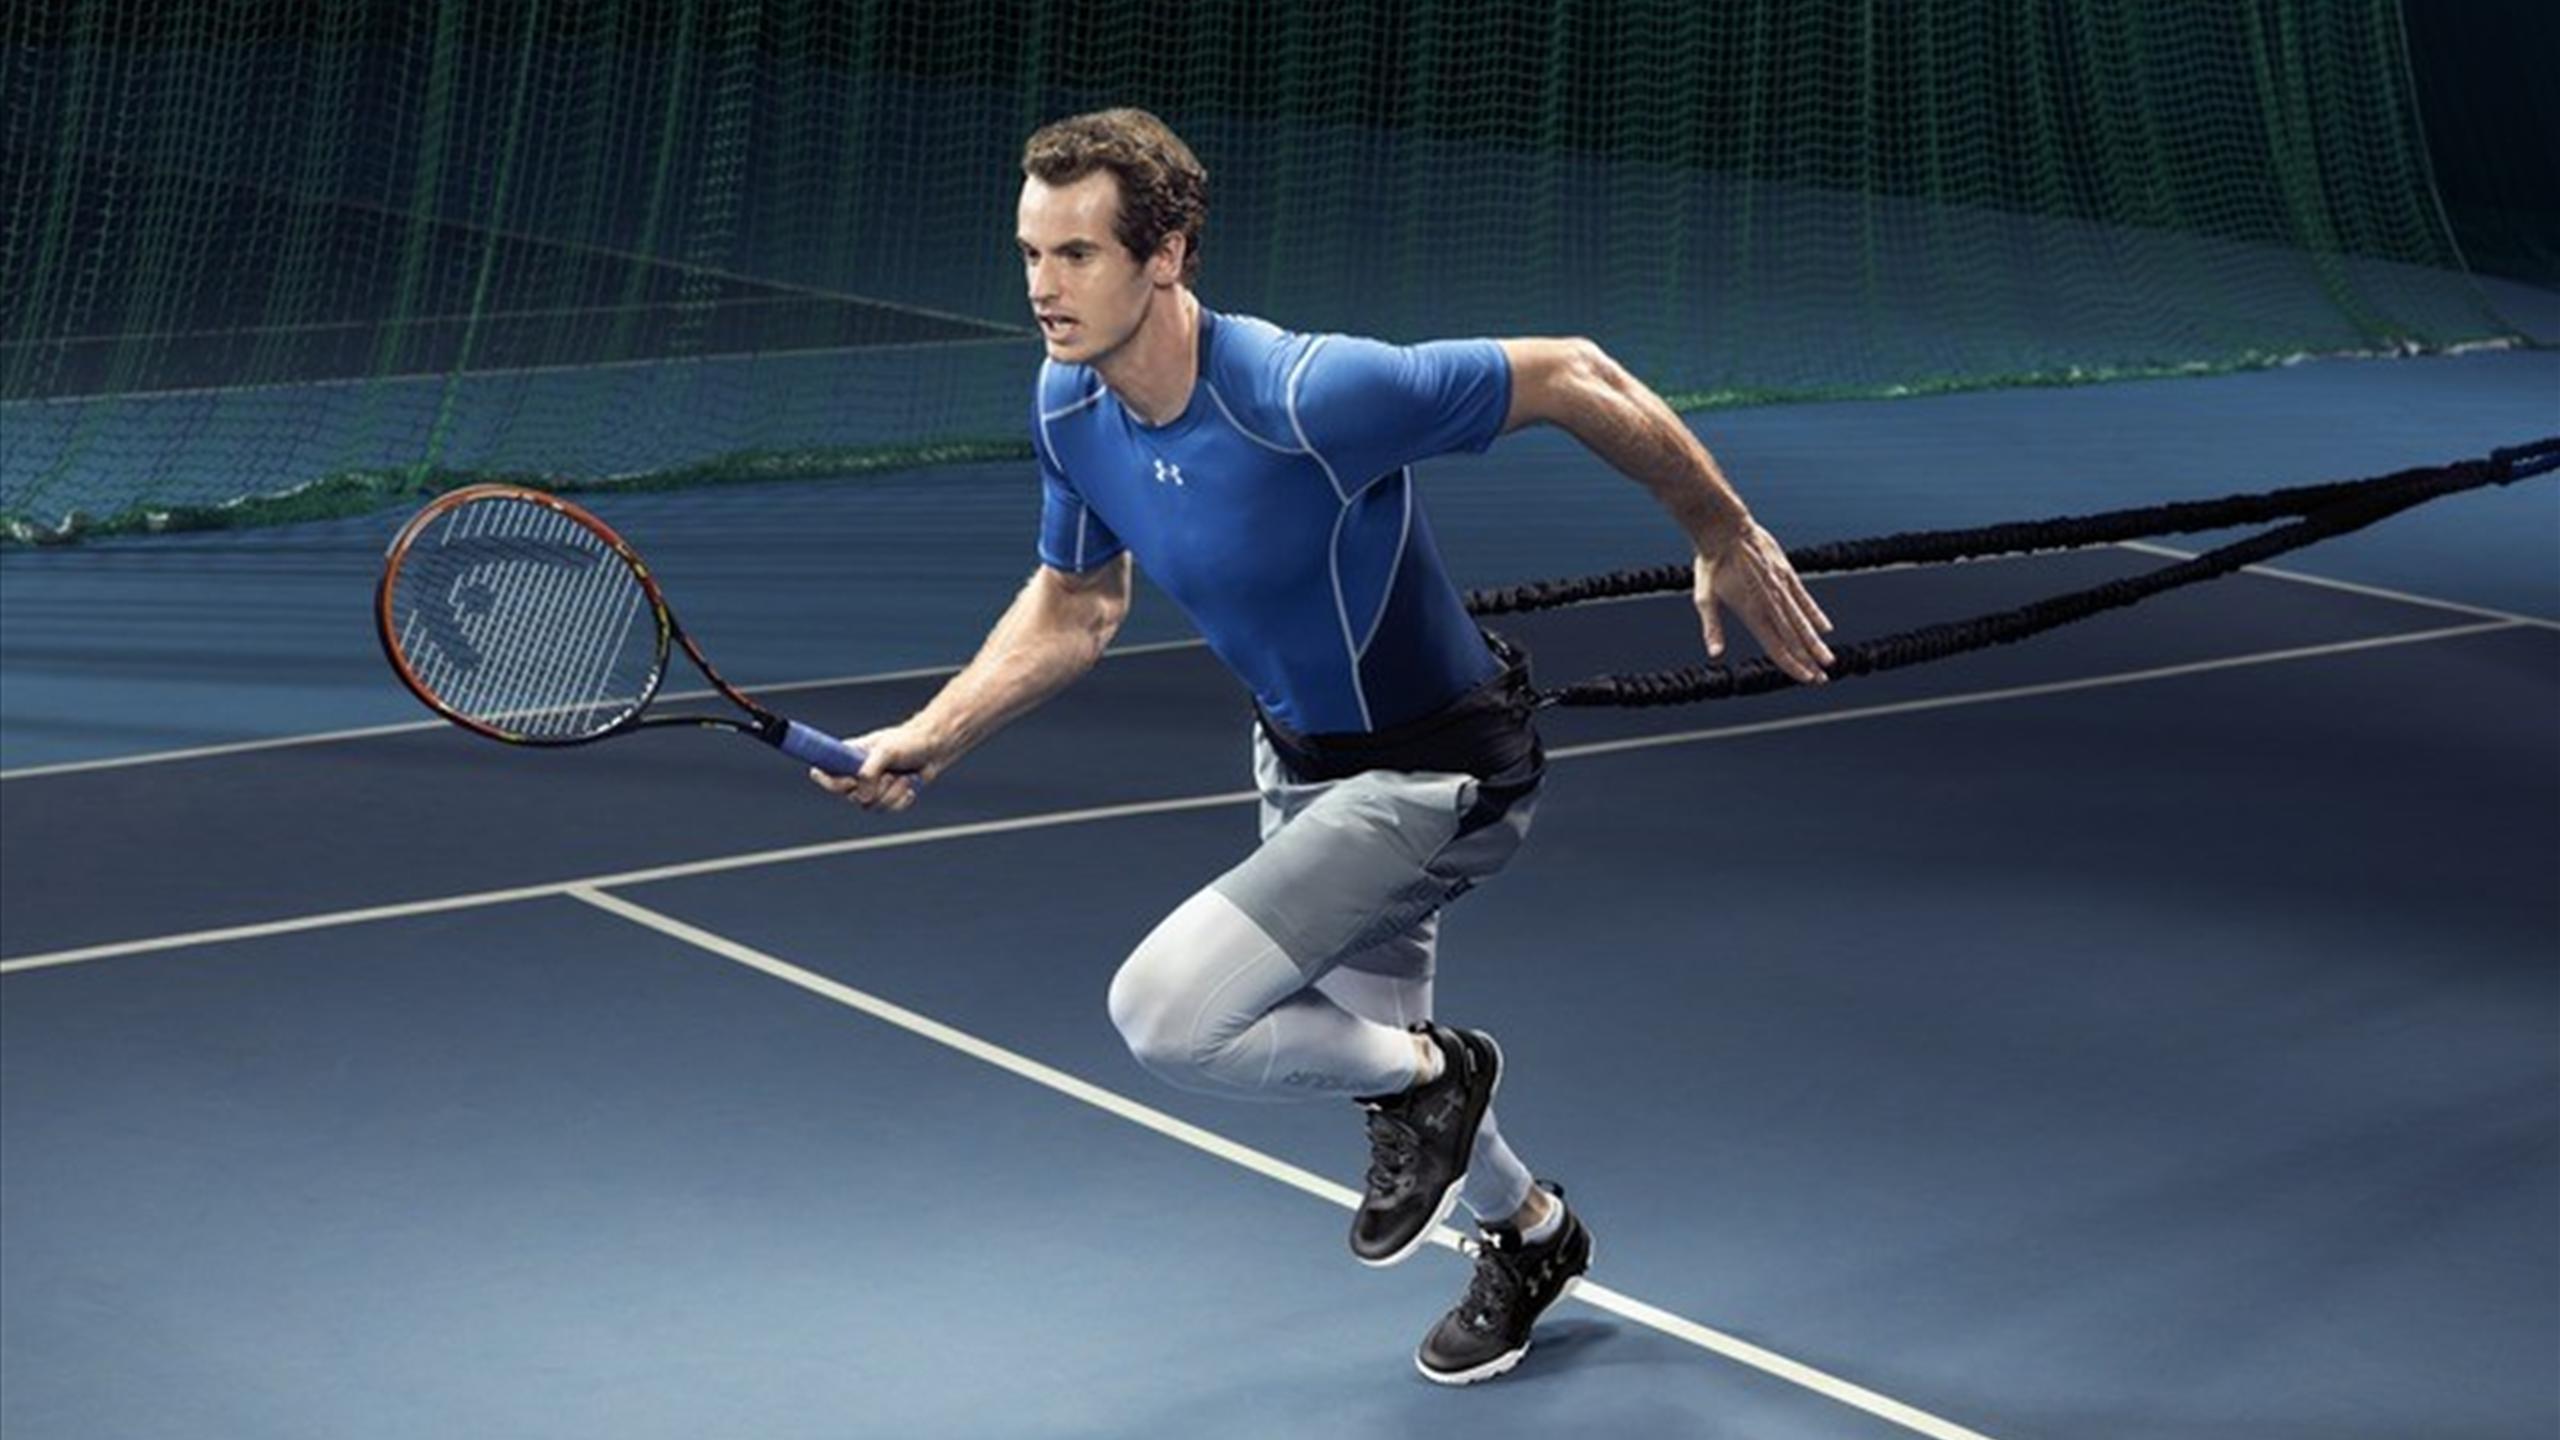 Buy Cheap Online Under Armor TennisFine Shoes